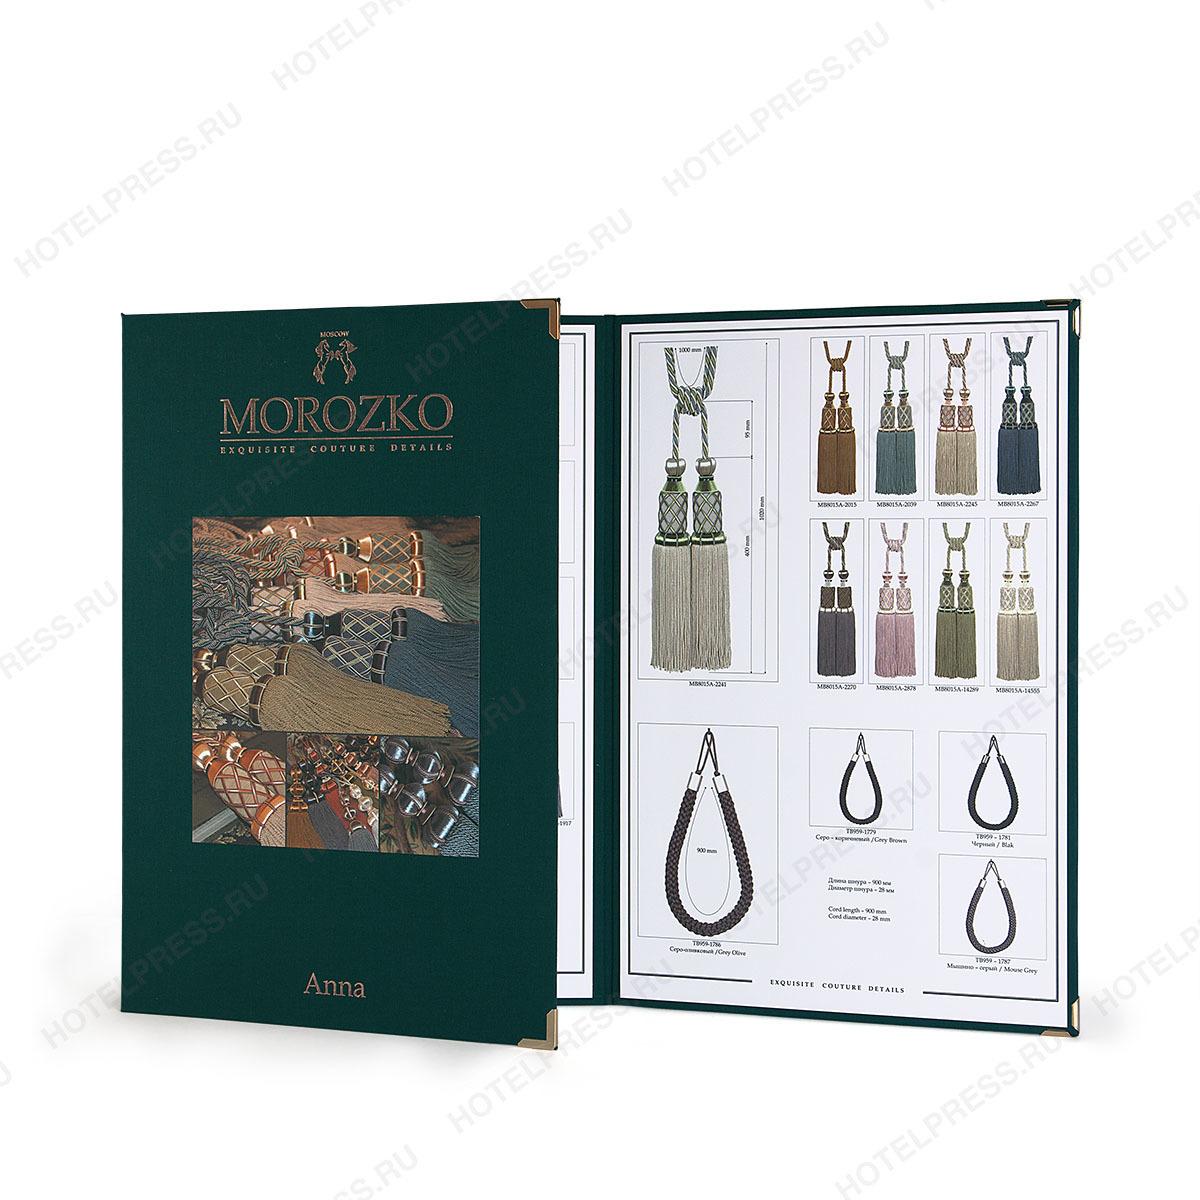 Каталог изделий декора Morozko EXQUISITE COUTURE DETAILS